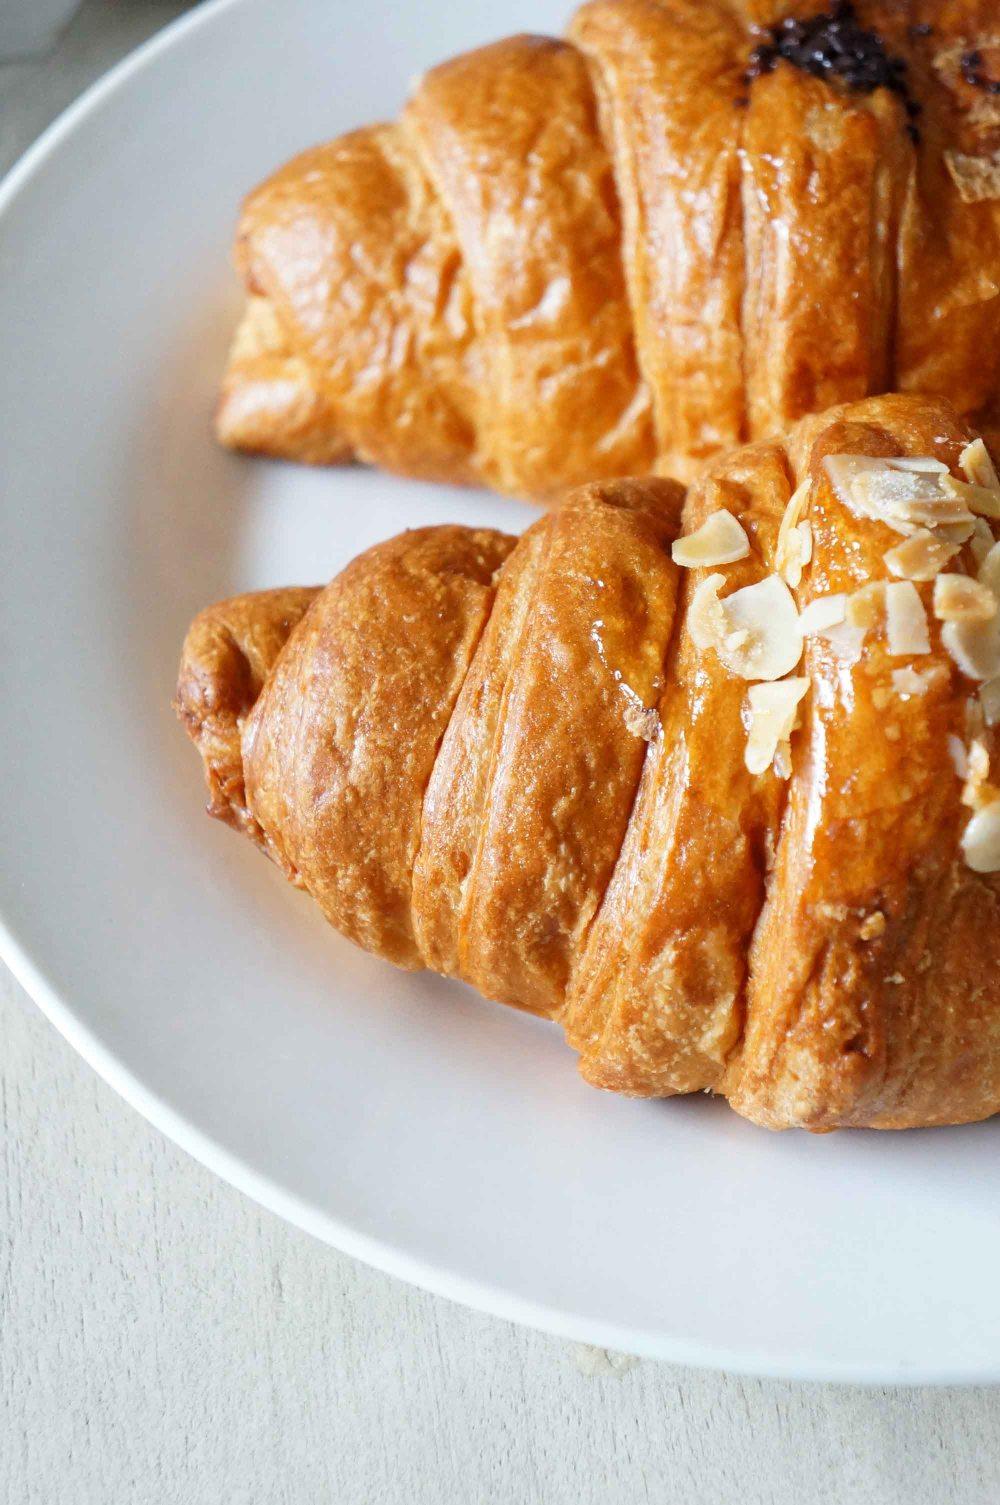 Bermain Croissant 2